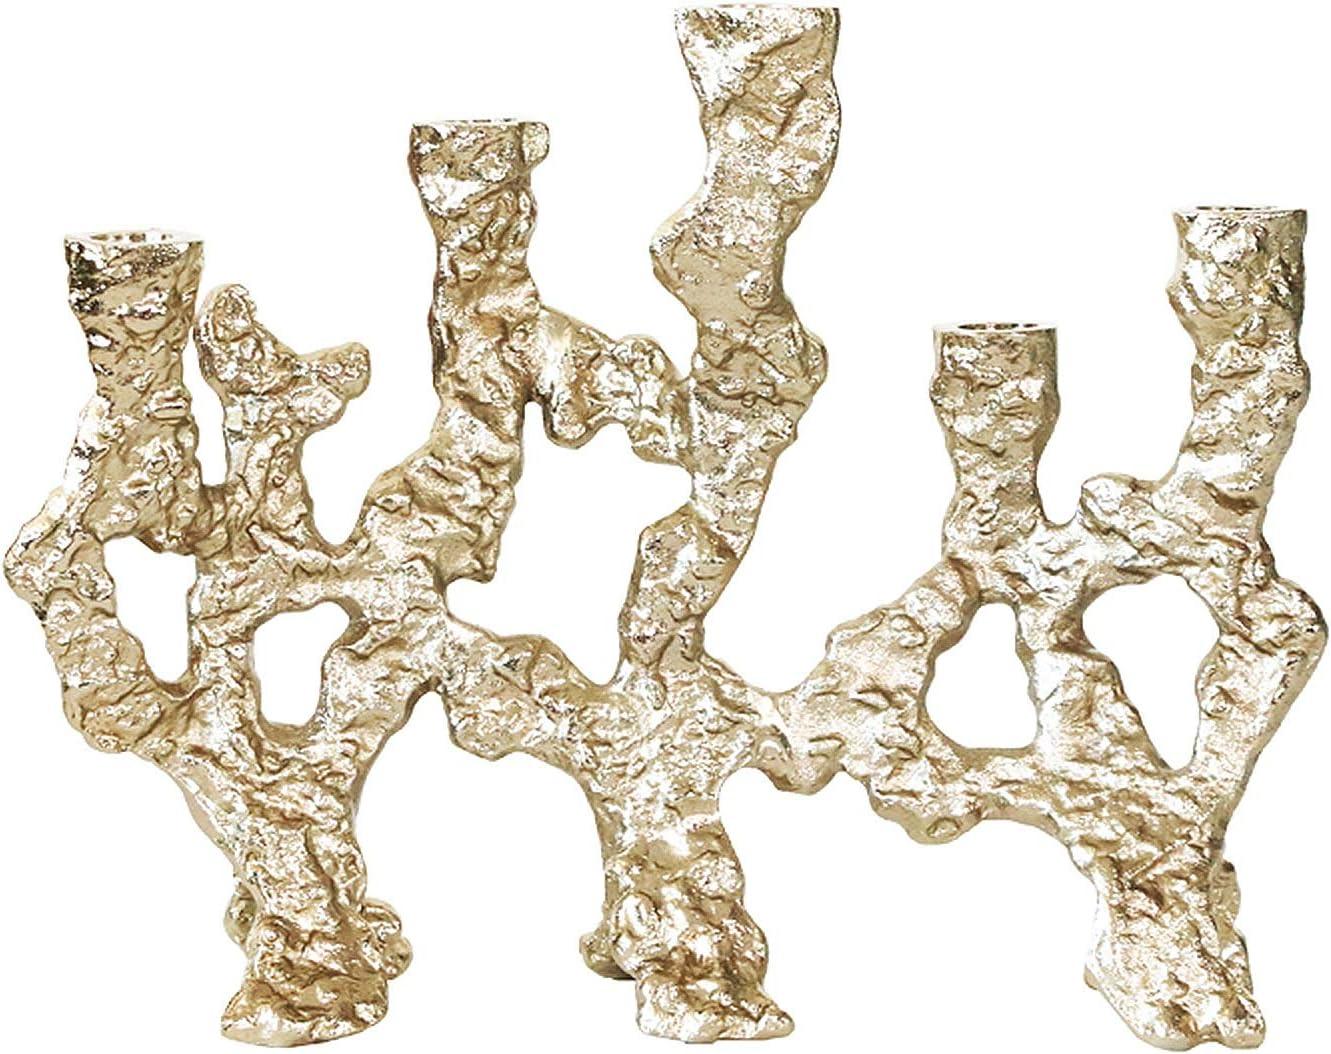 DUOWEI Creativity Candle Holder Candl Fashion Irregular Five-Head Metal Max 83% OFF